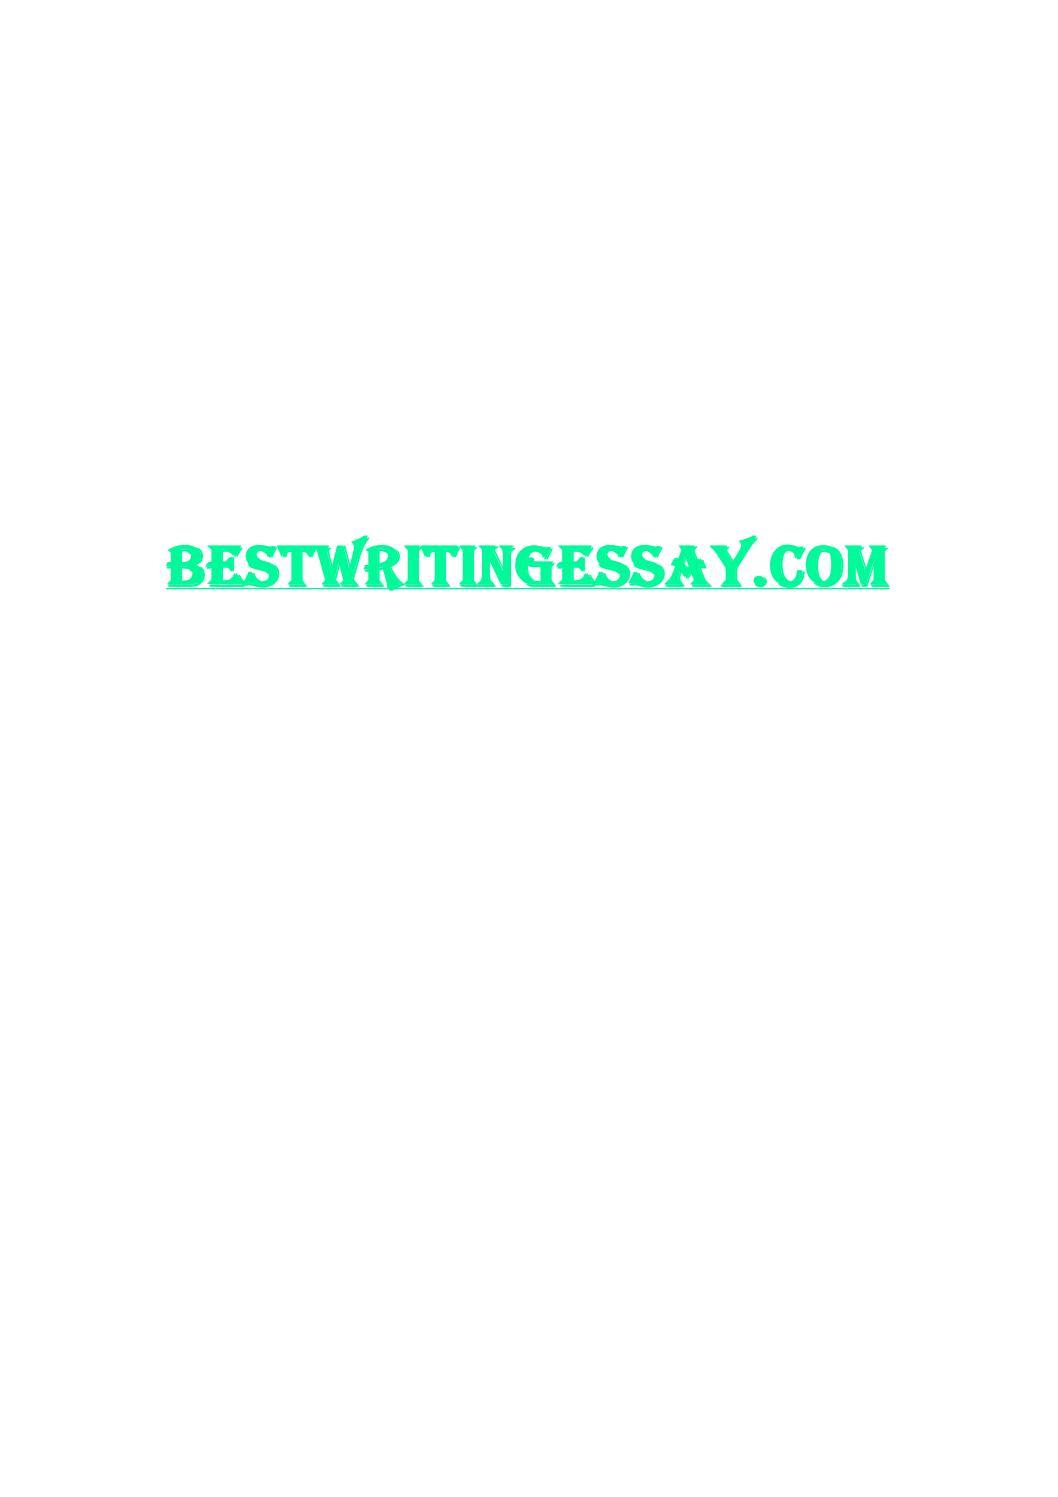 Professional argumentative essay editor service for college